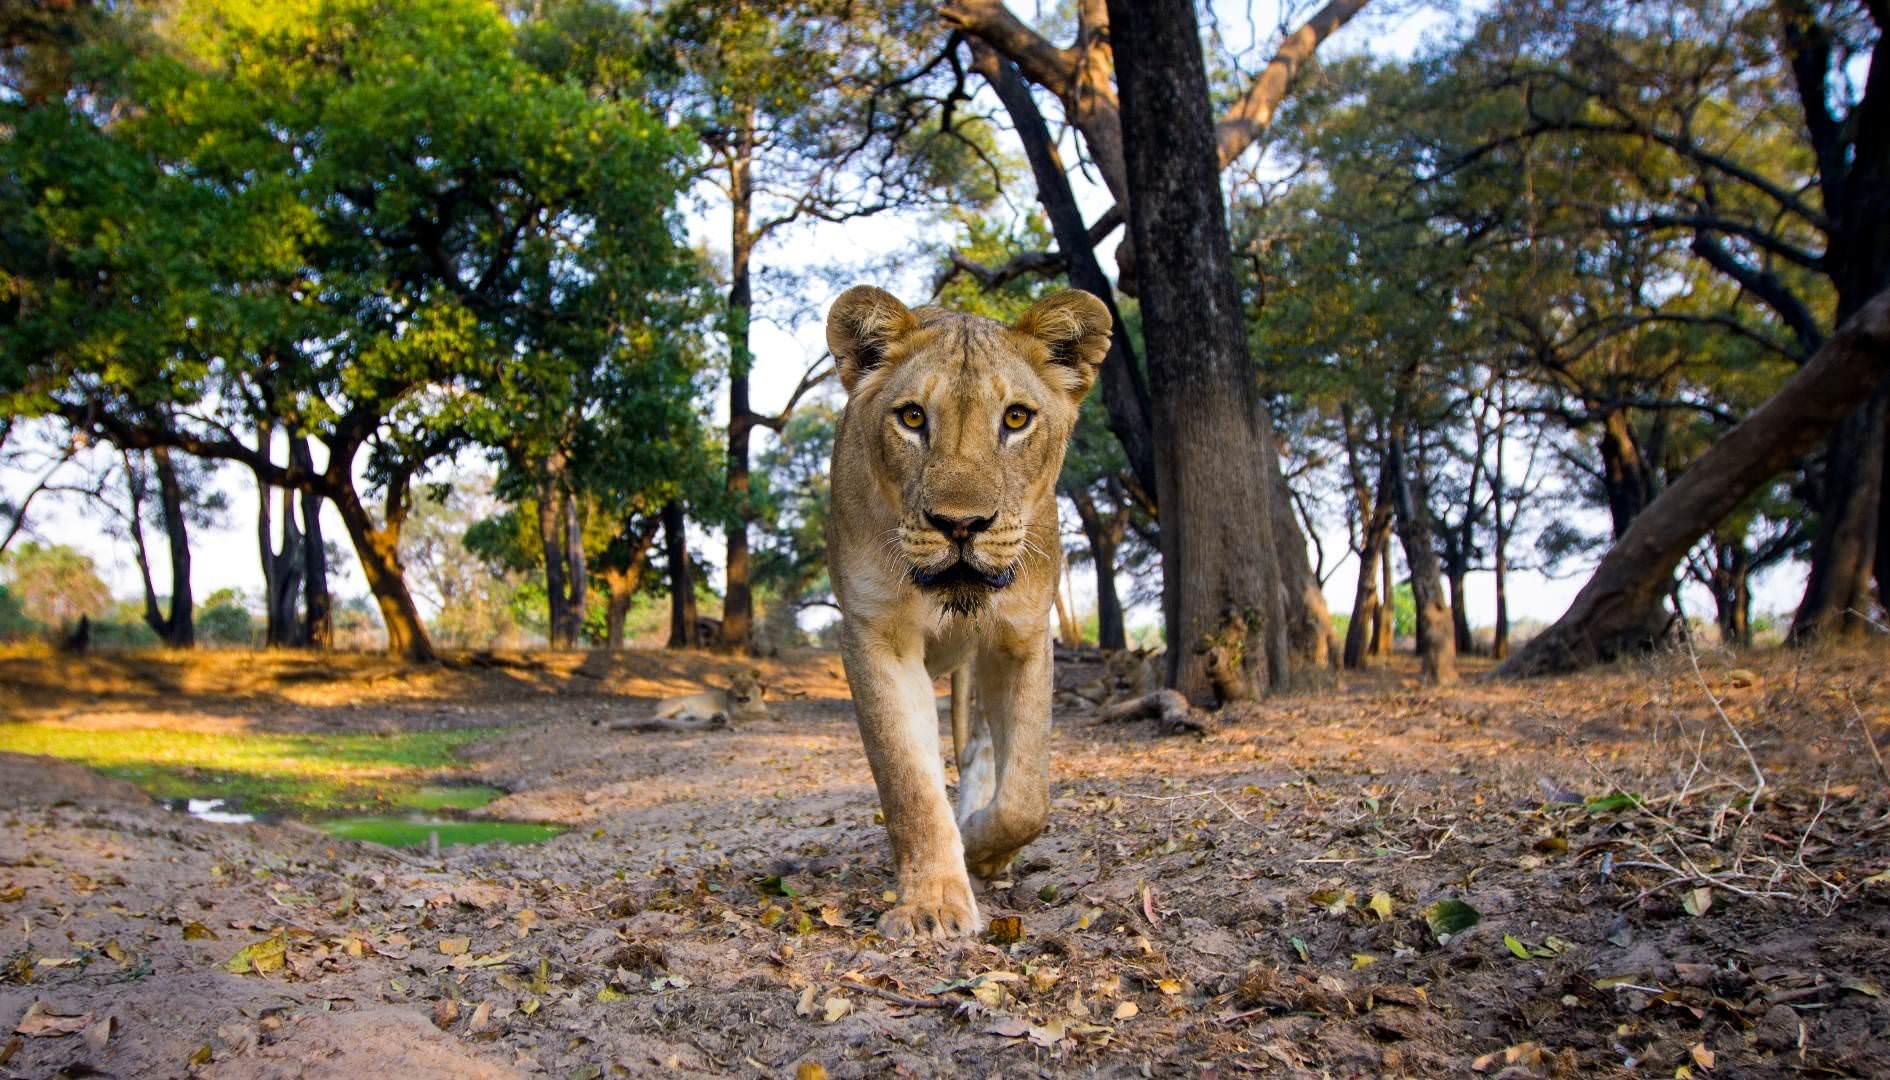 Lowe luangwa sambia mit pintoafrica.com